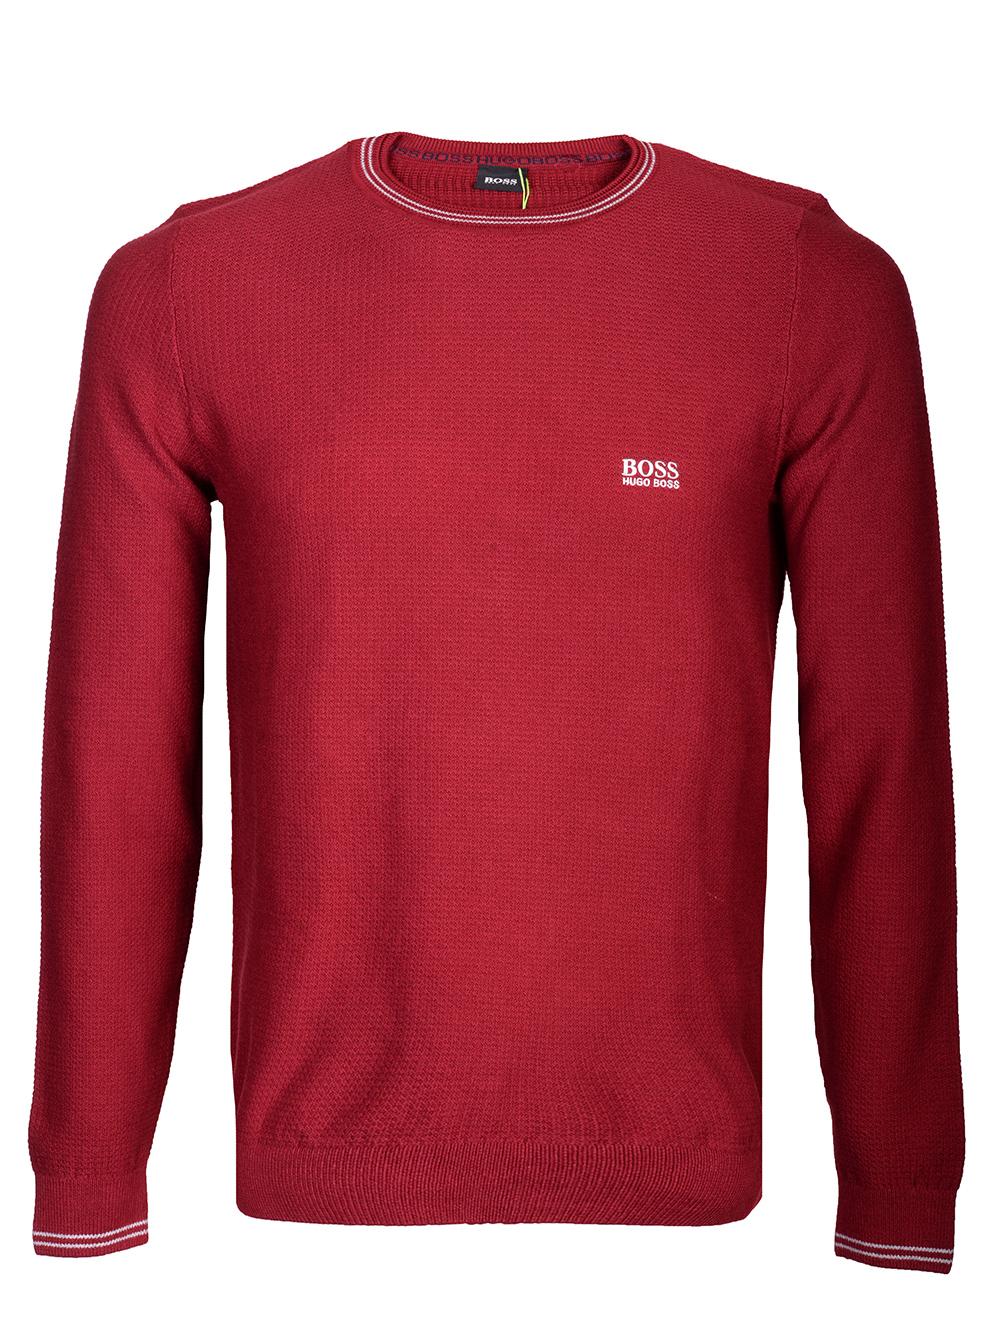 BOSS GREEN Μπλούζα πουλόβερ 50413659-604 ΜΠΟΡΝΤΩ